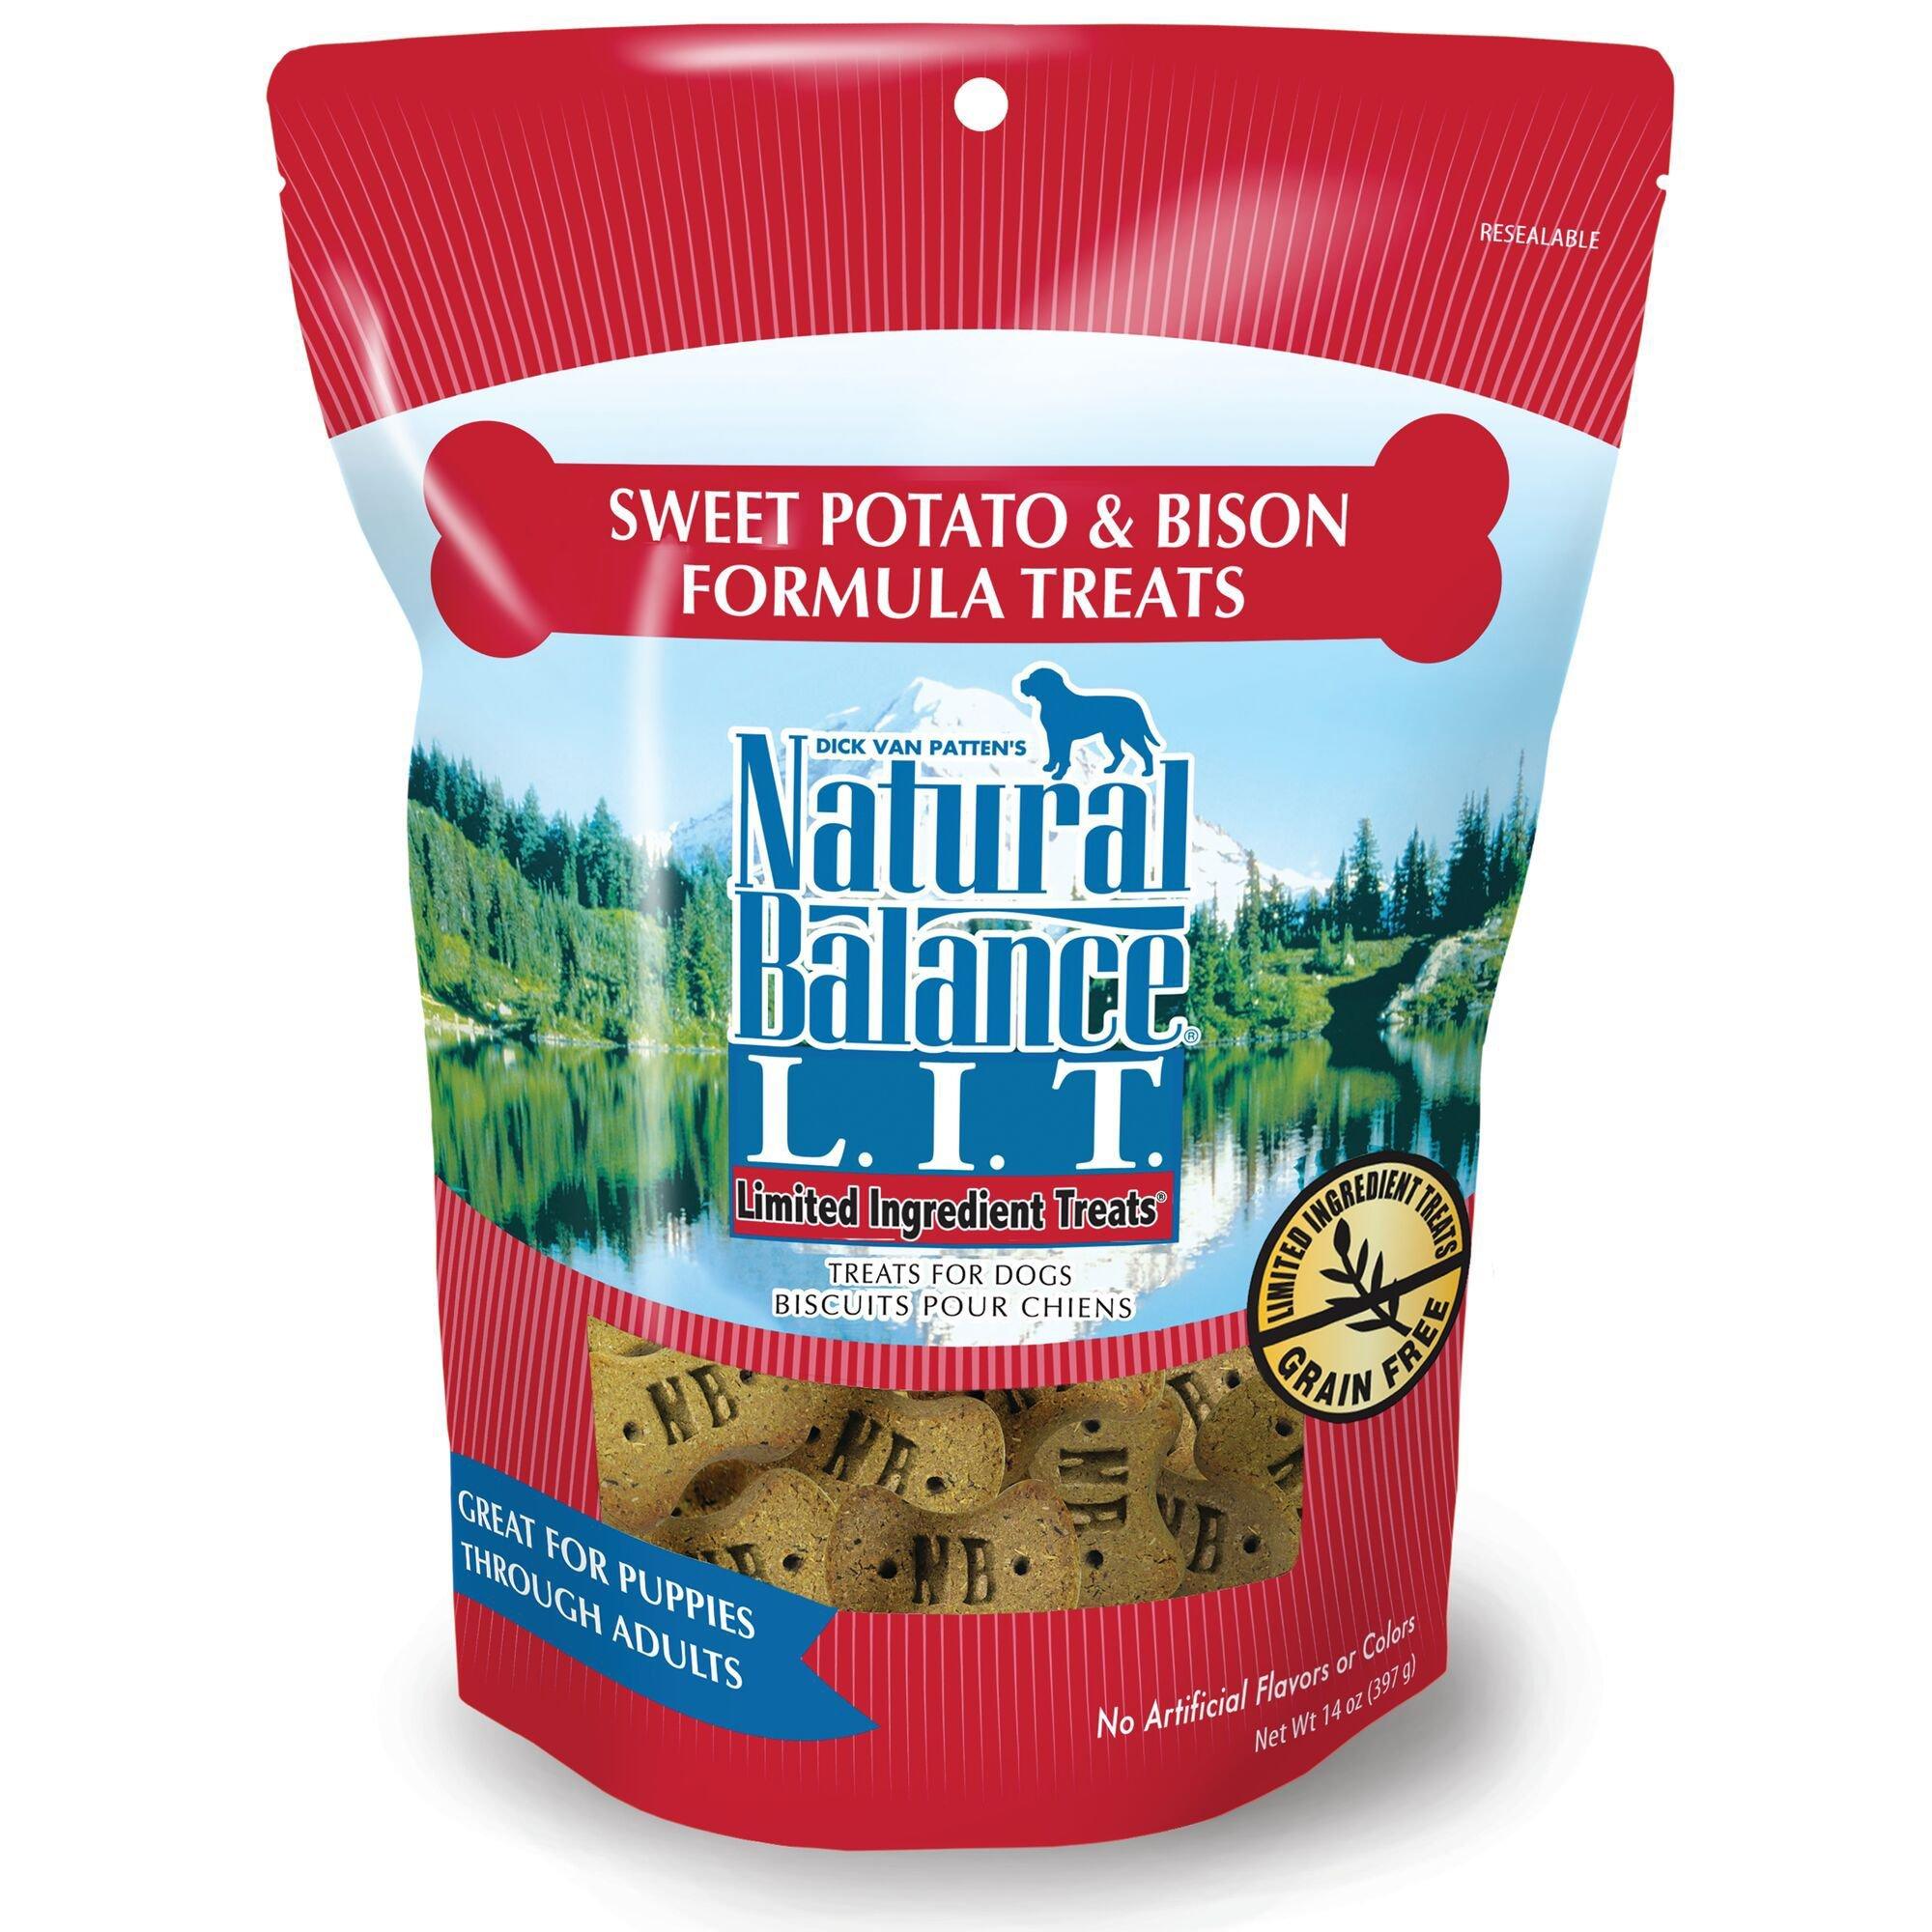 Natural Balance L.I.T. Limited Ingredient Treats Sweet Potato & Bison Formula Dog Treats